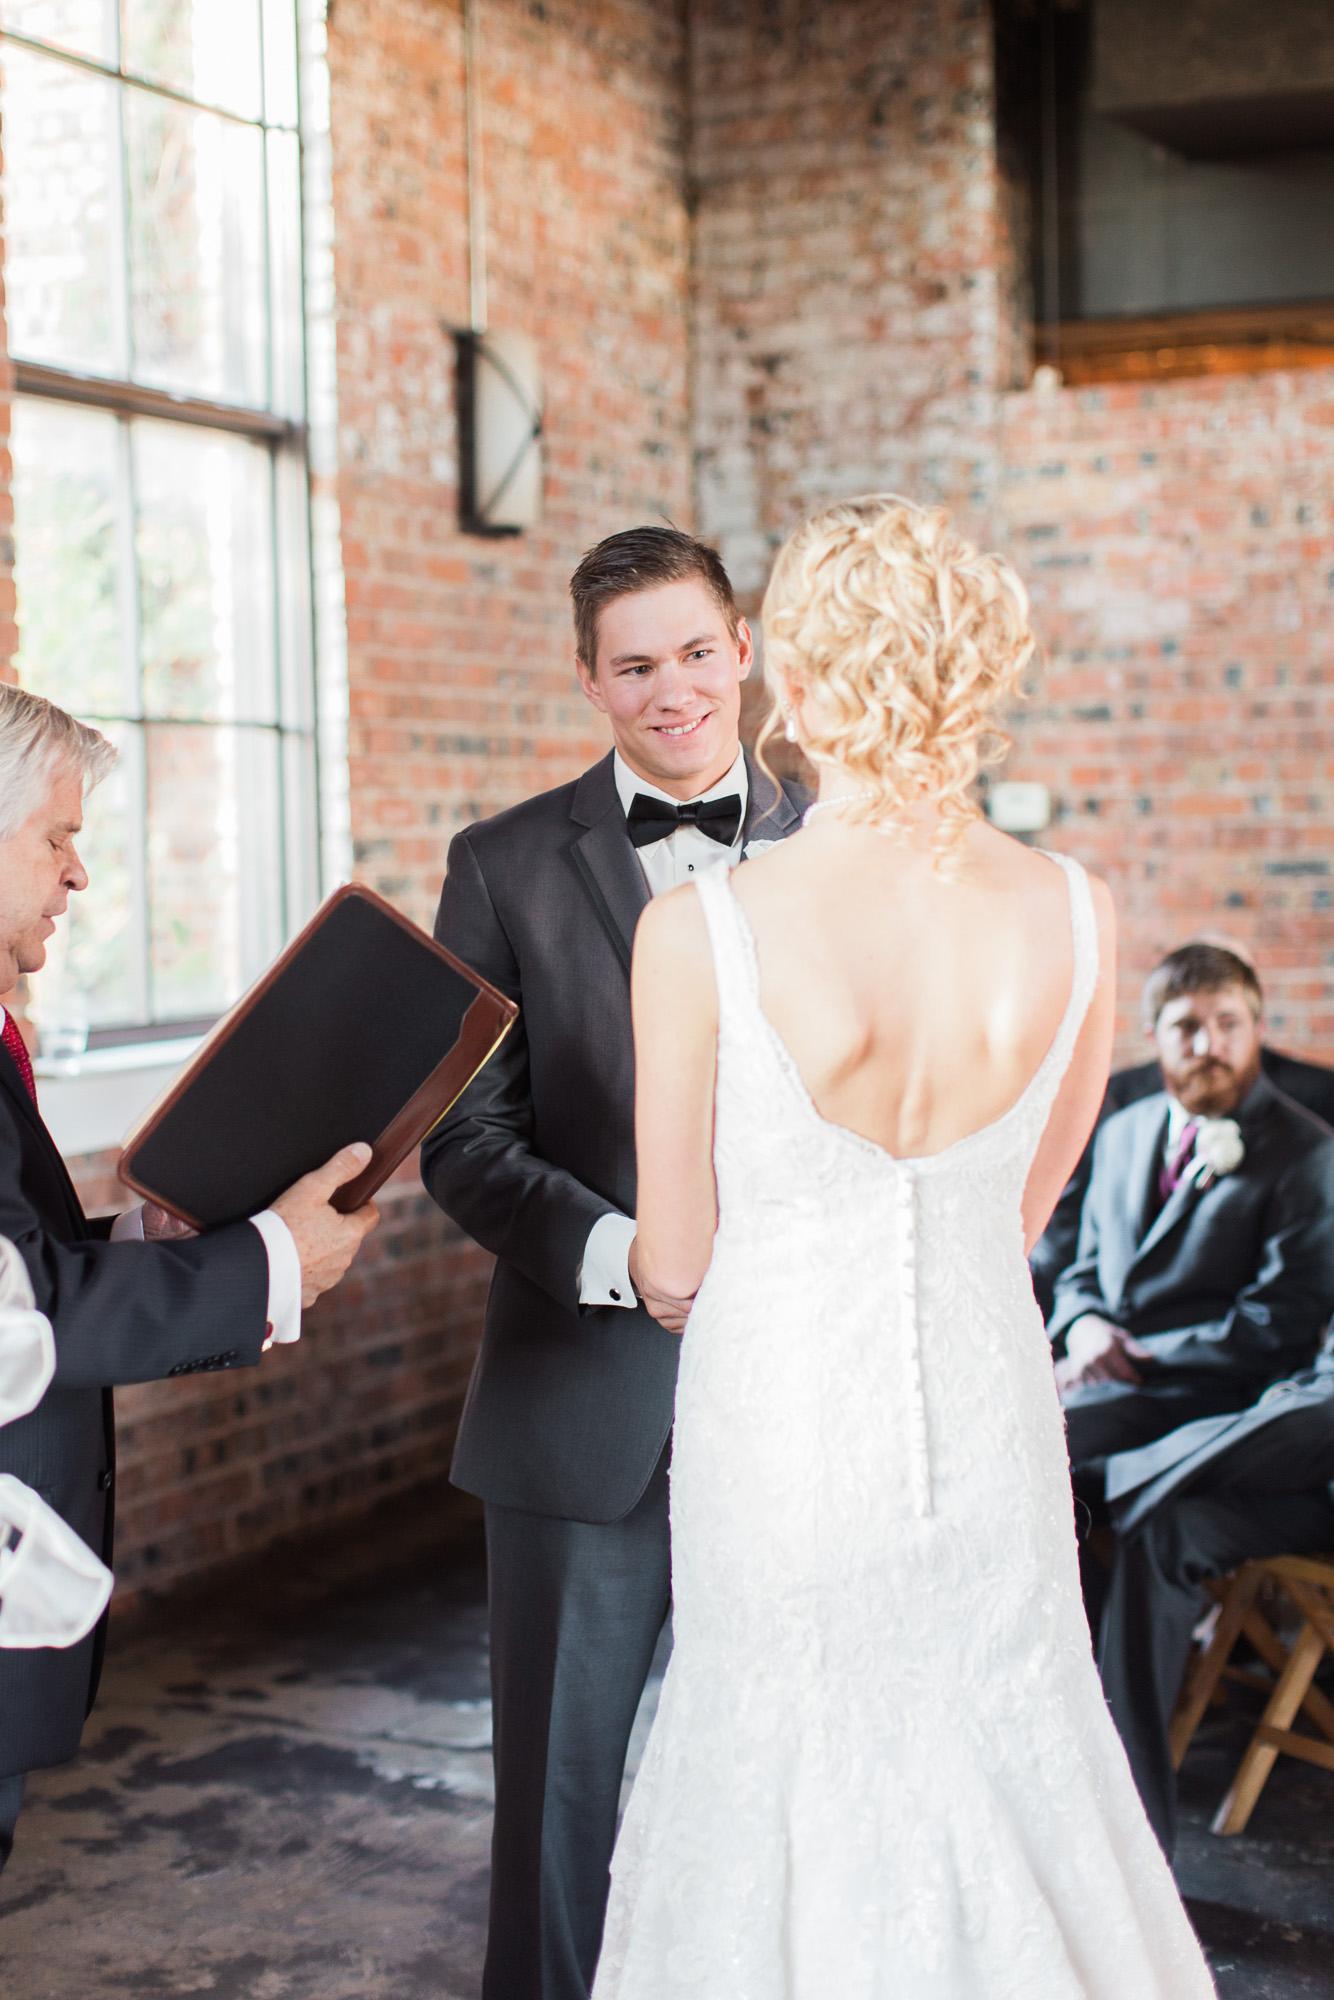 52987-downtown-bryan-weddingdowntown-bryan-wedding.jpg